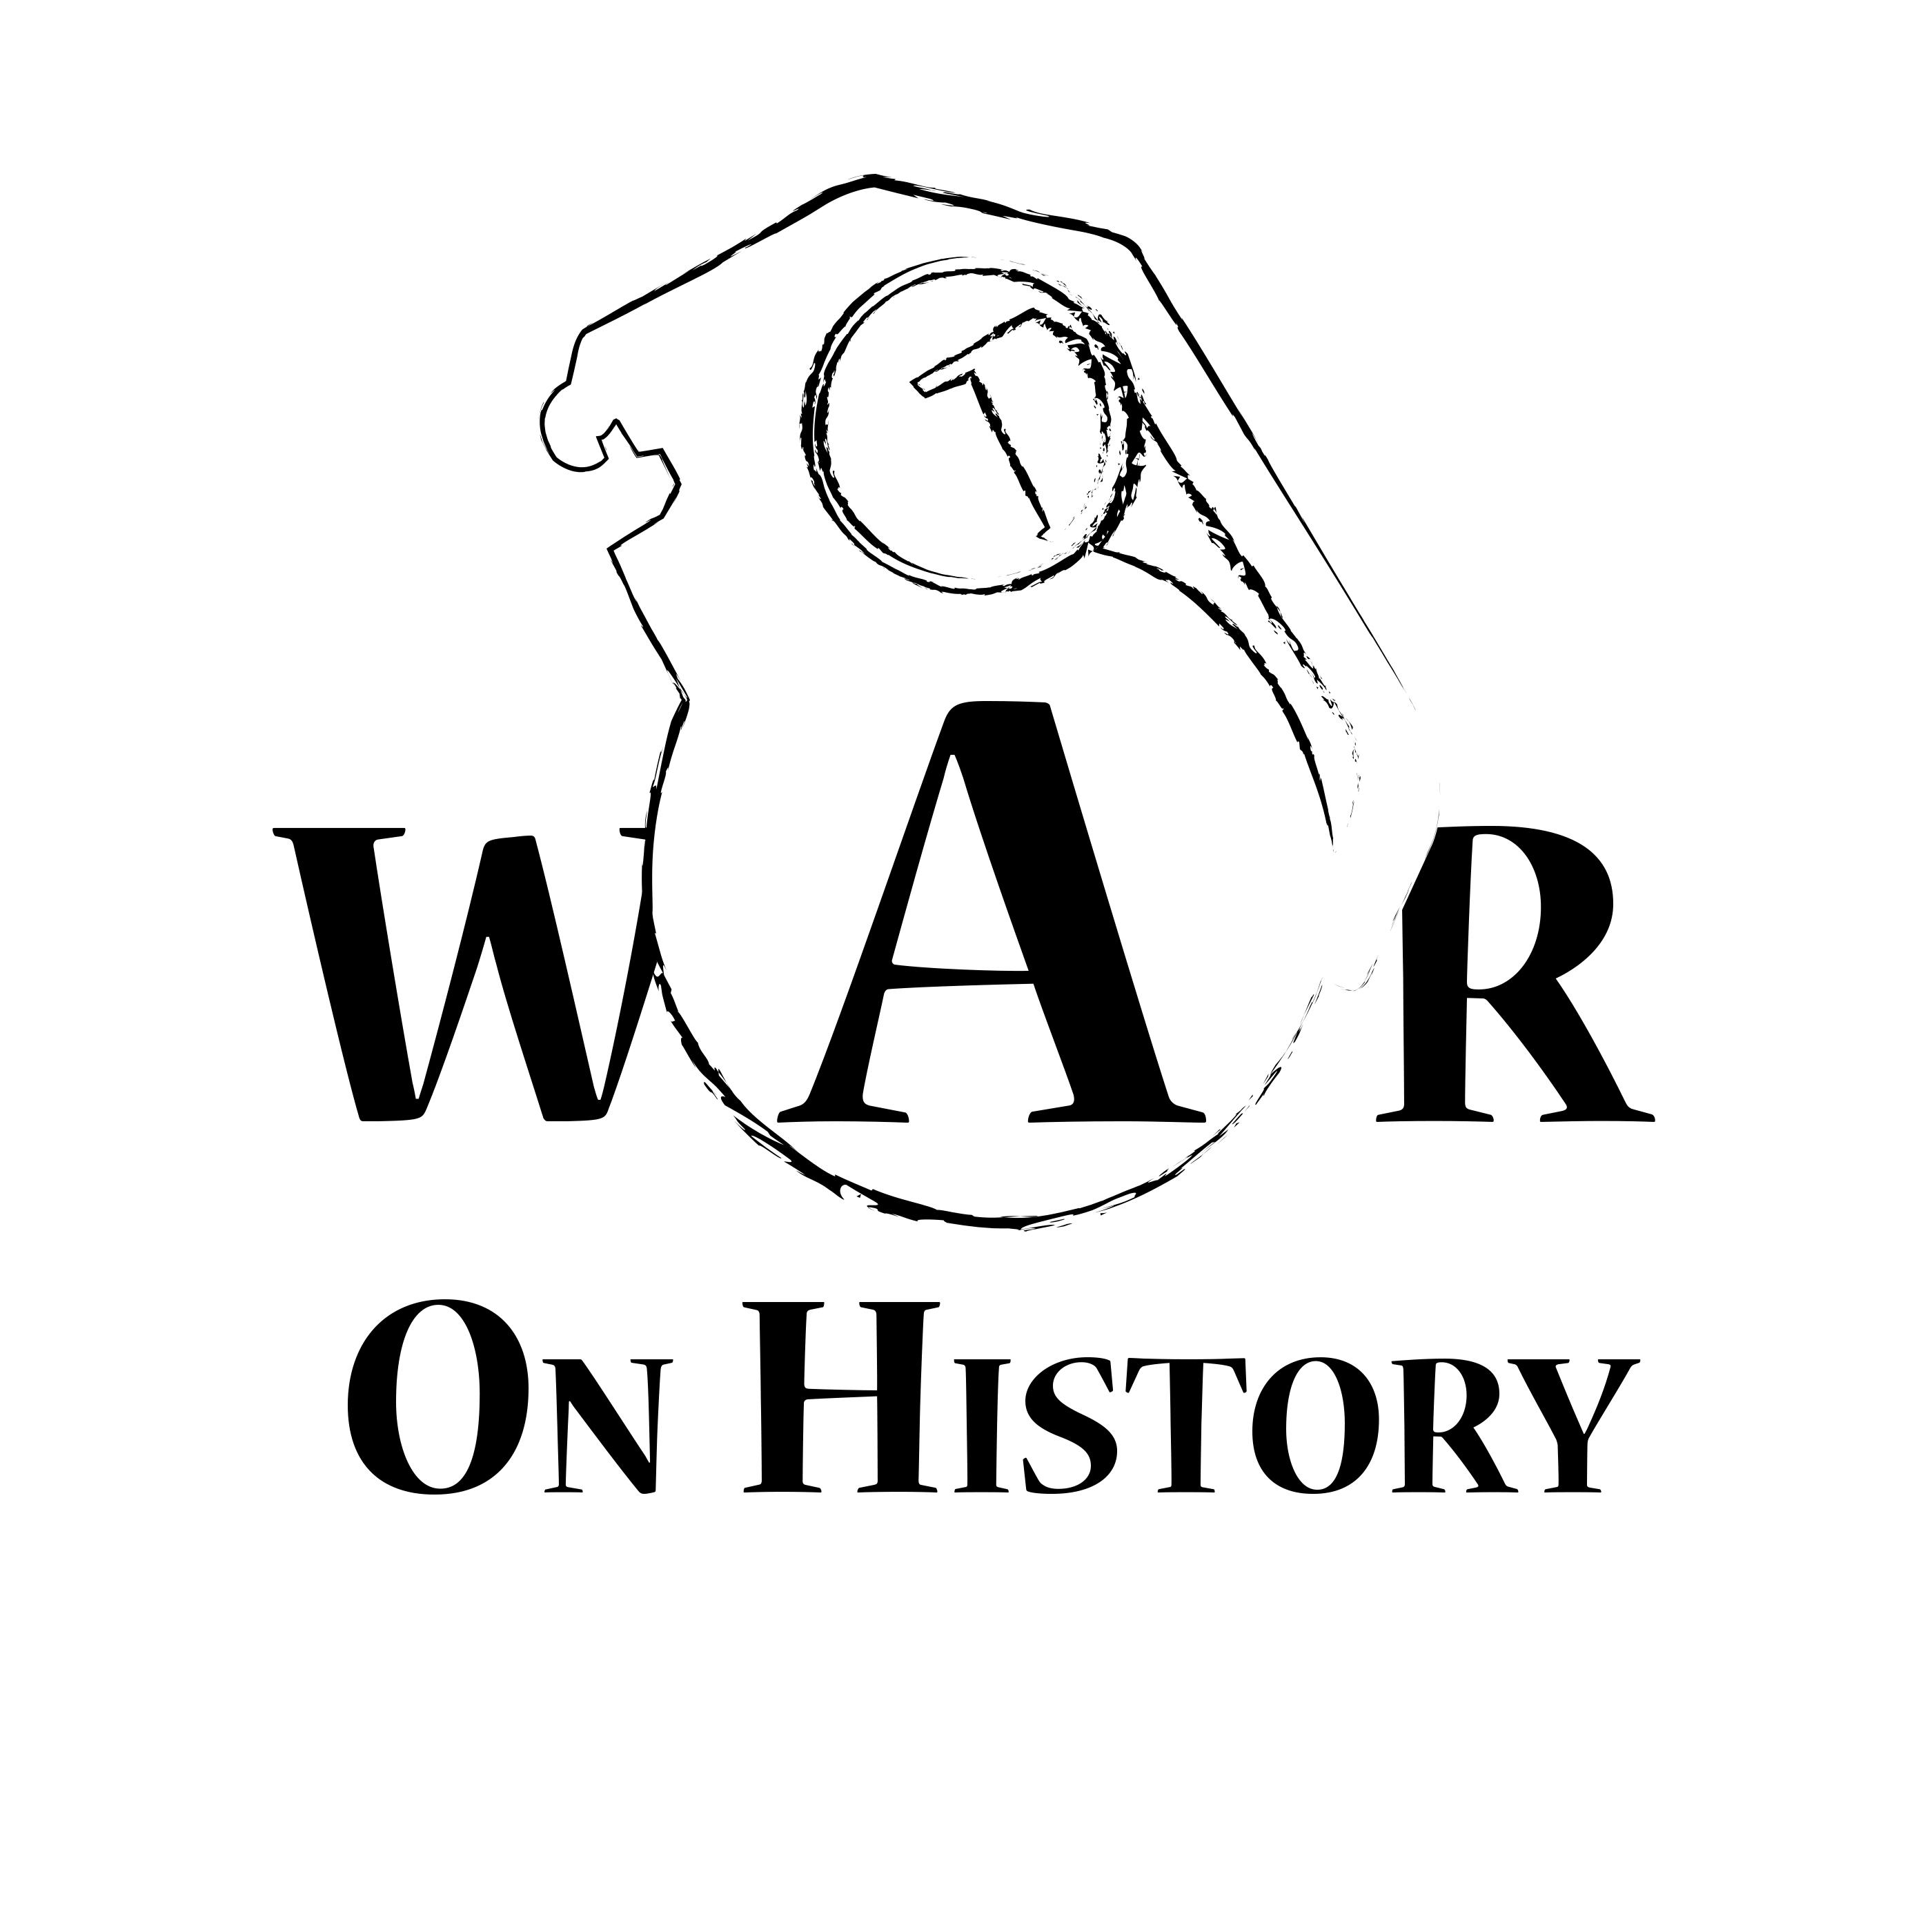 War on History